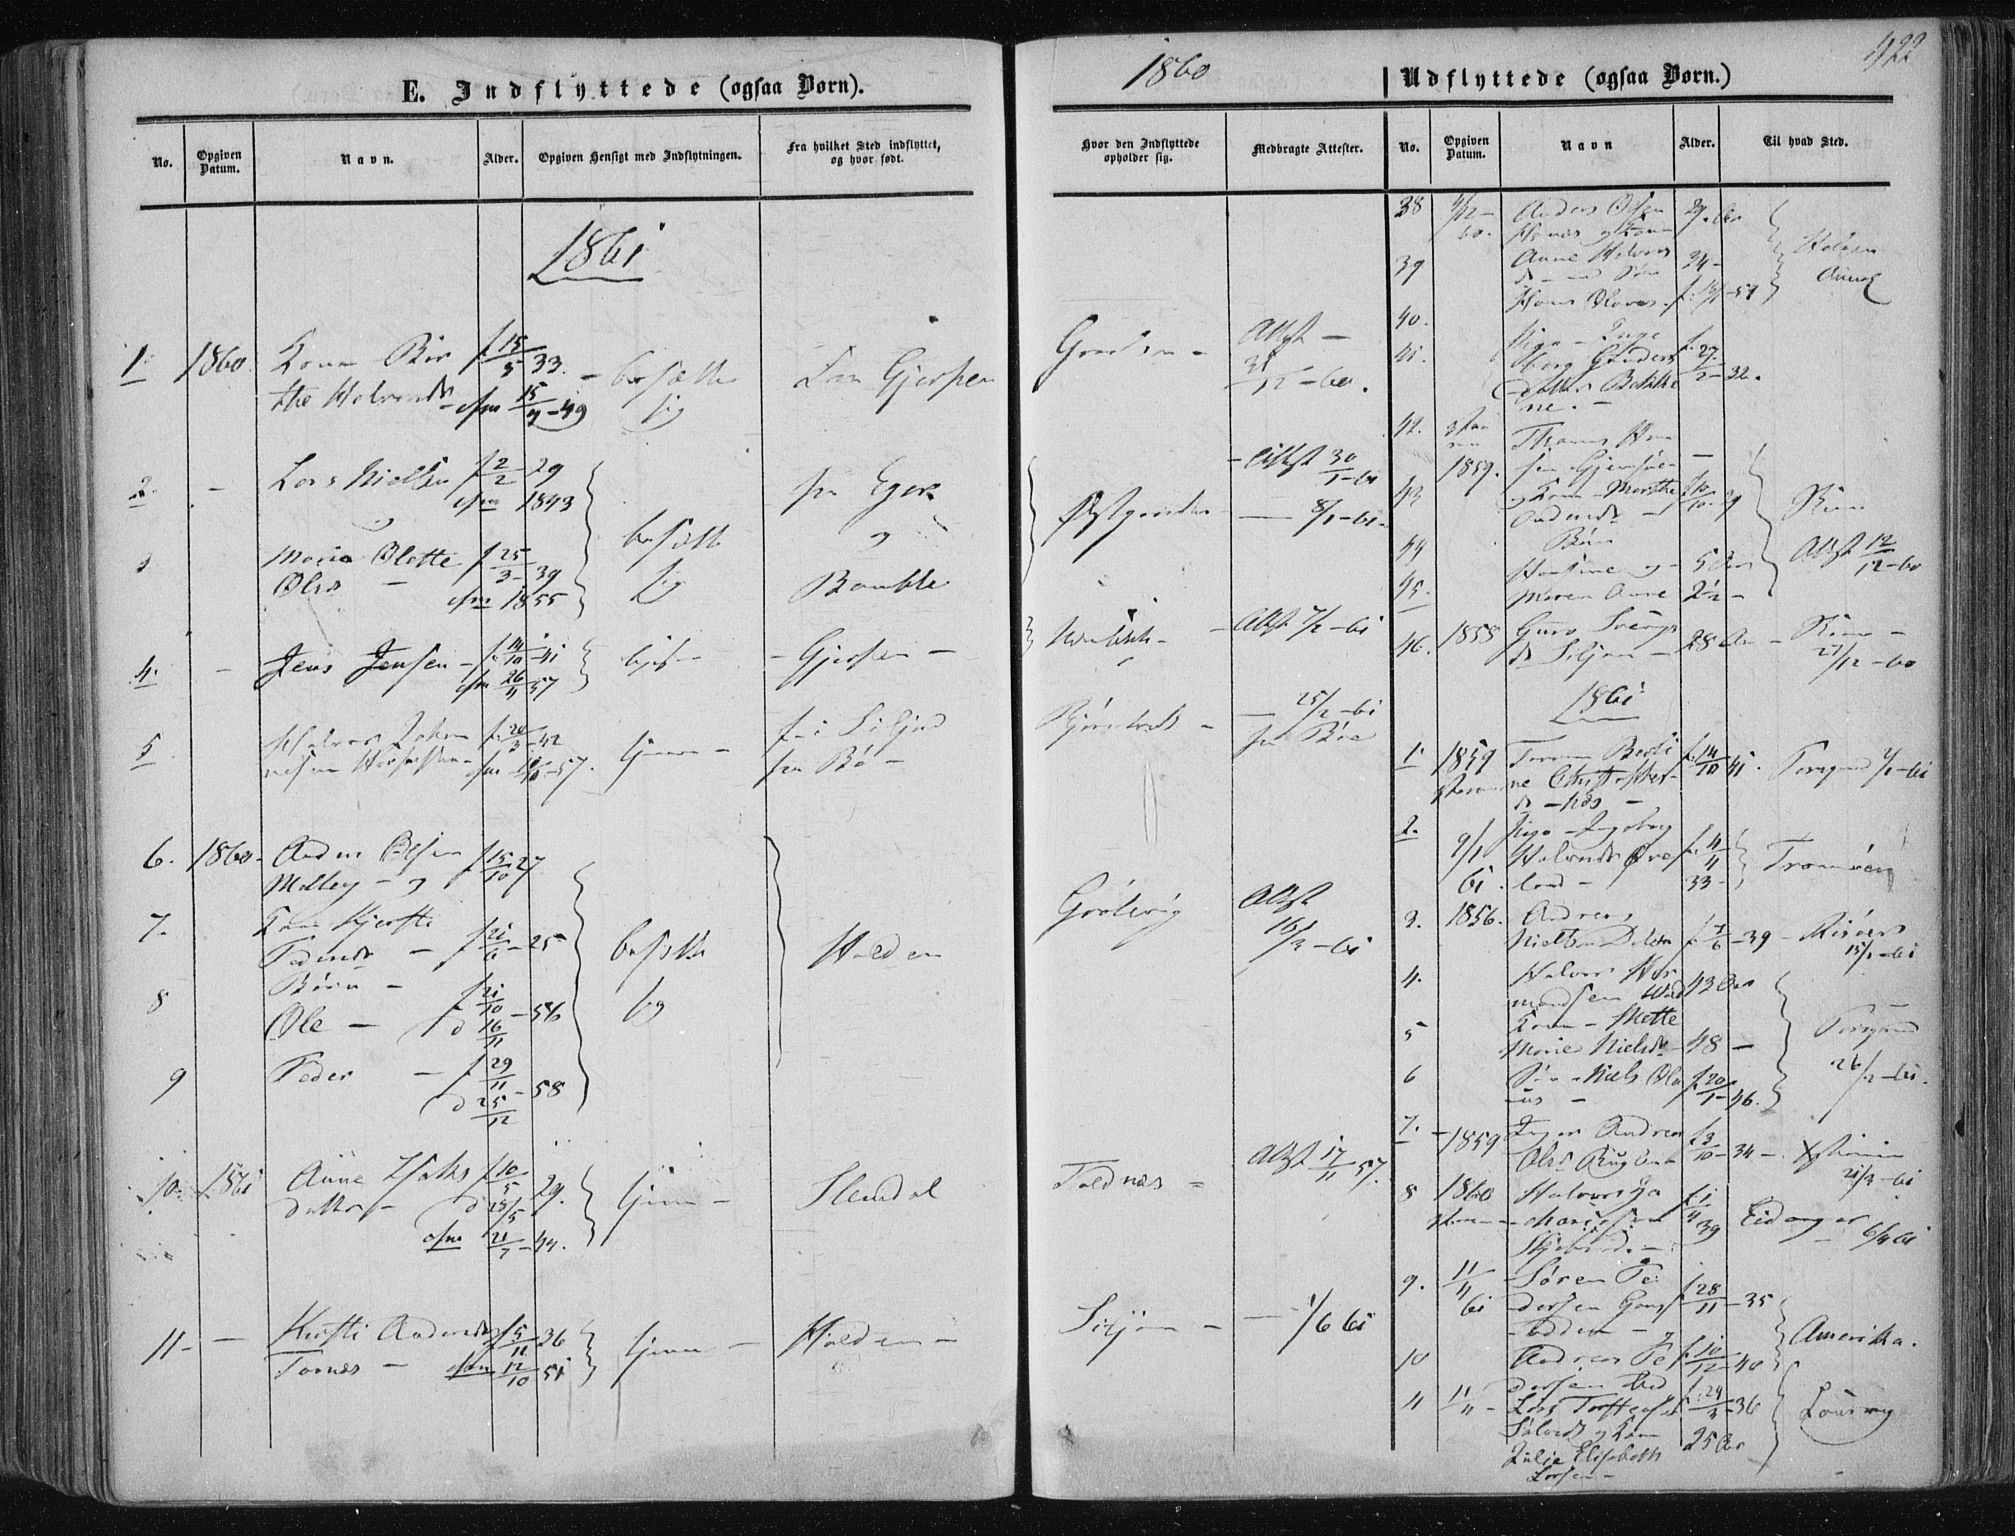 SAKO, Solum kirkebøker, F/Fa/L0007: Ministerialbok nr. I 7, 1856-1864, s. 422